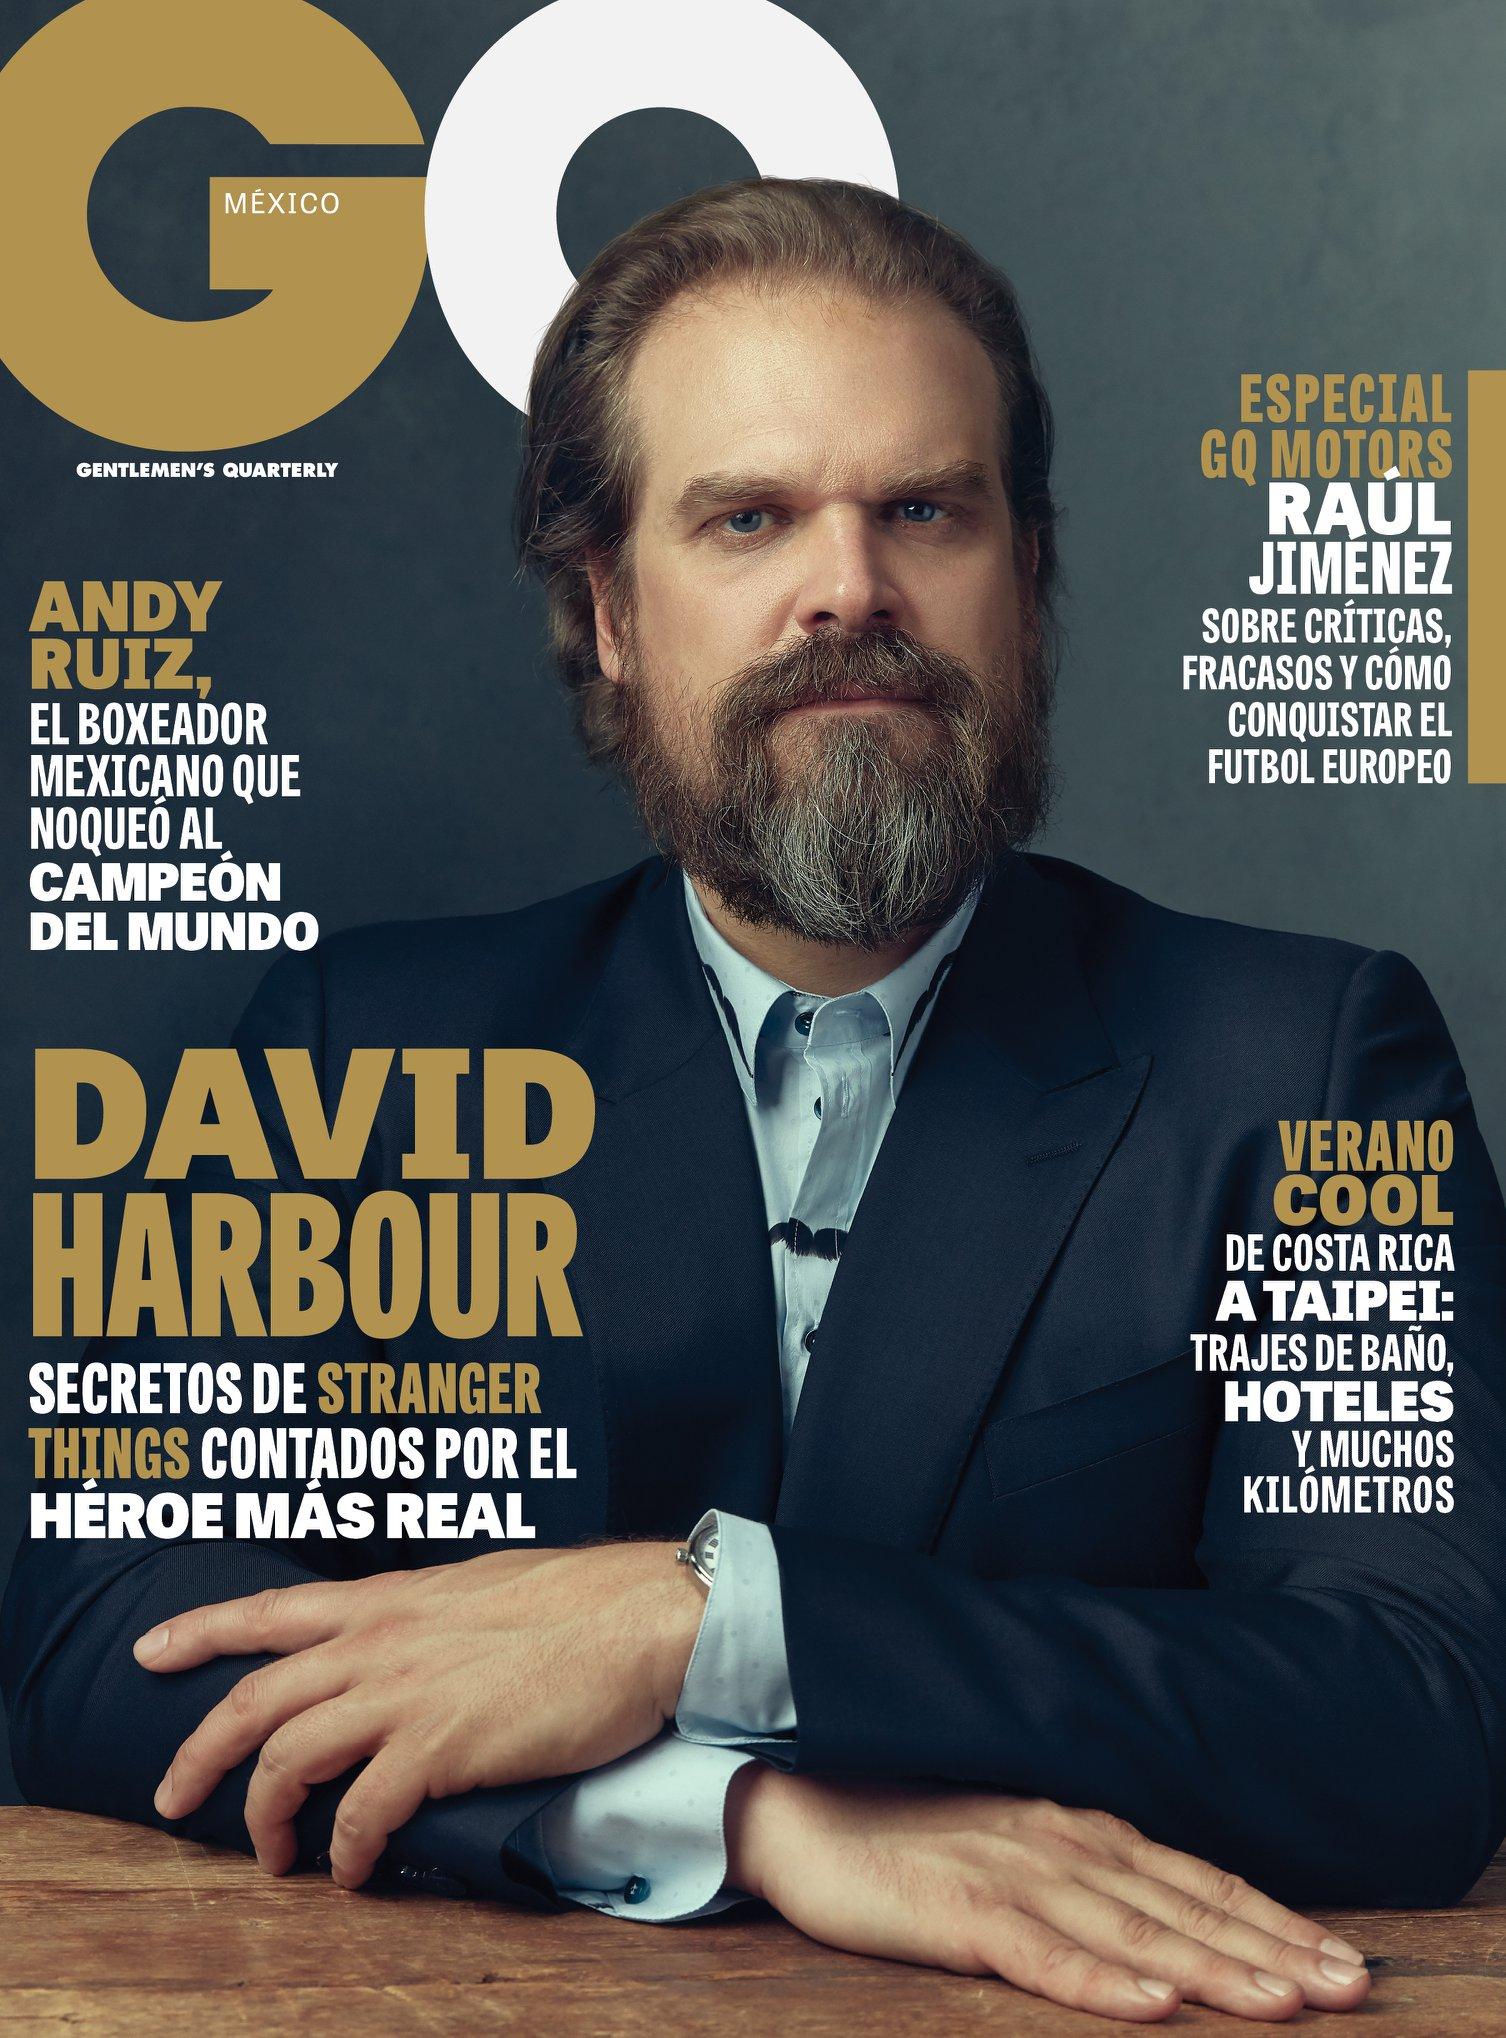 David Harbour Cover.jpg